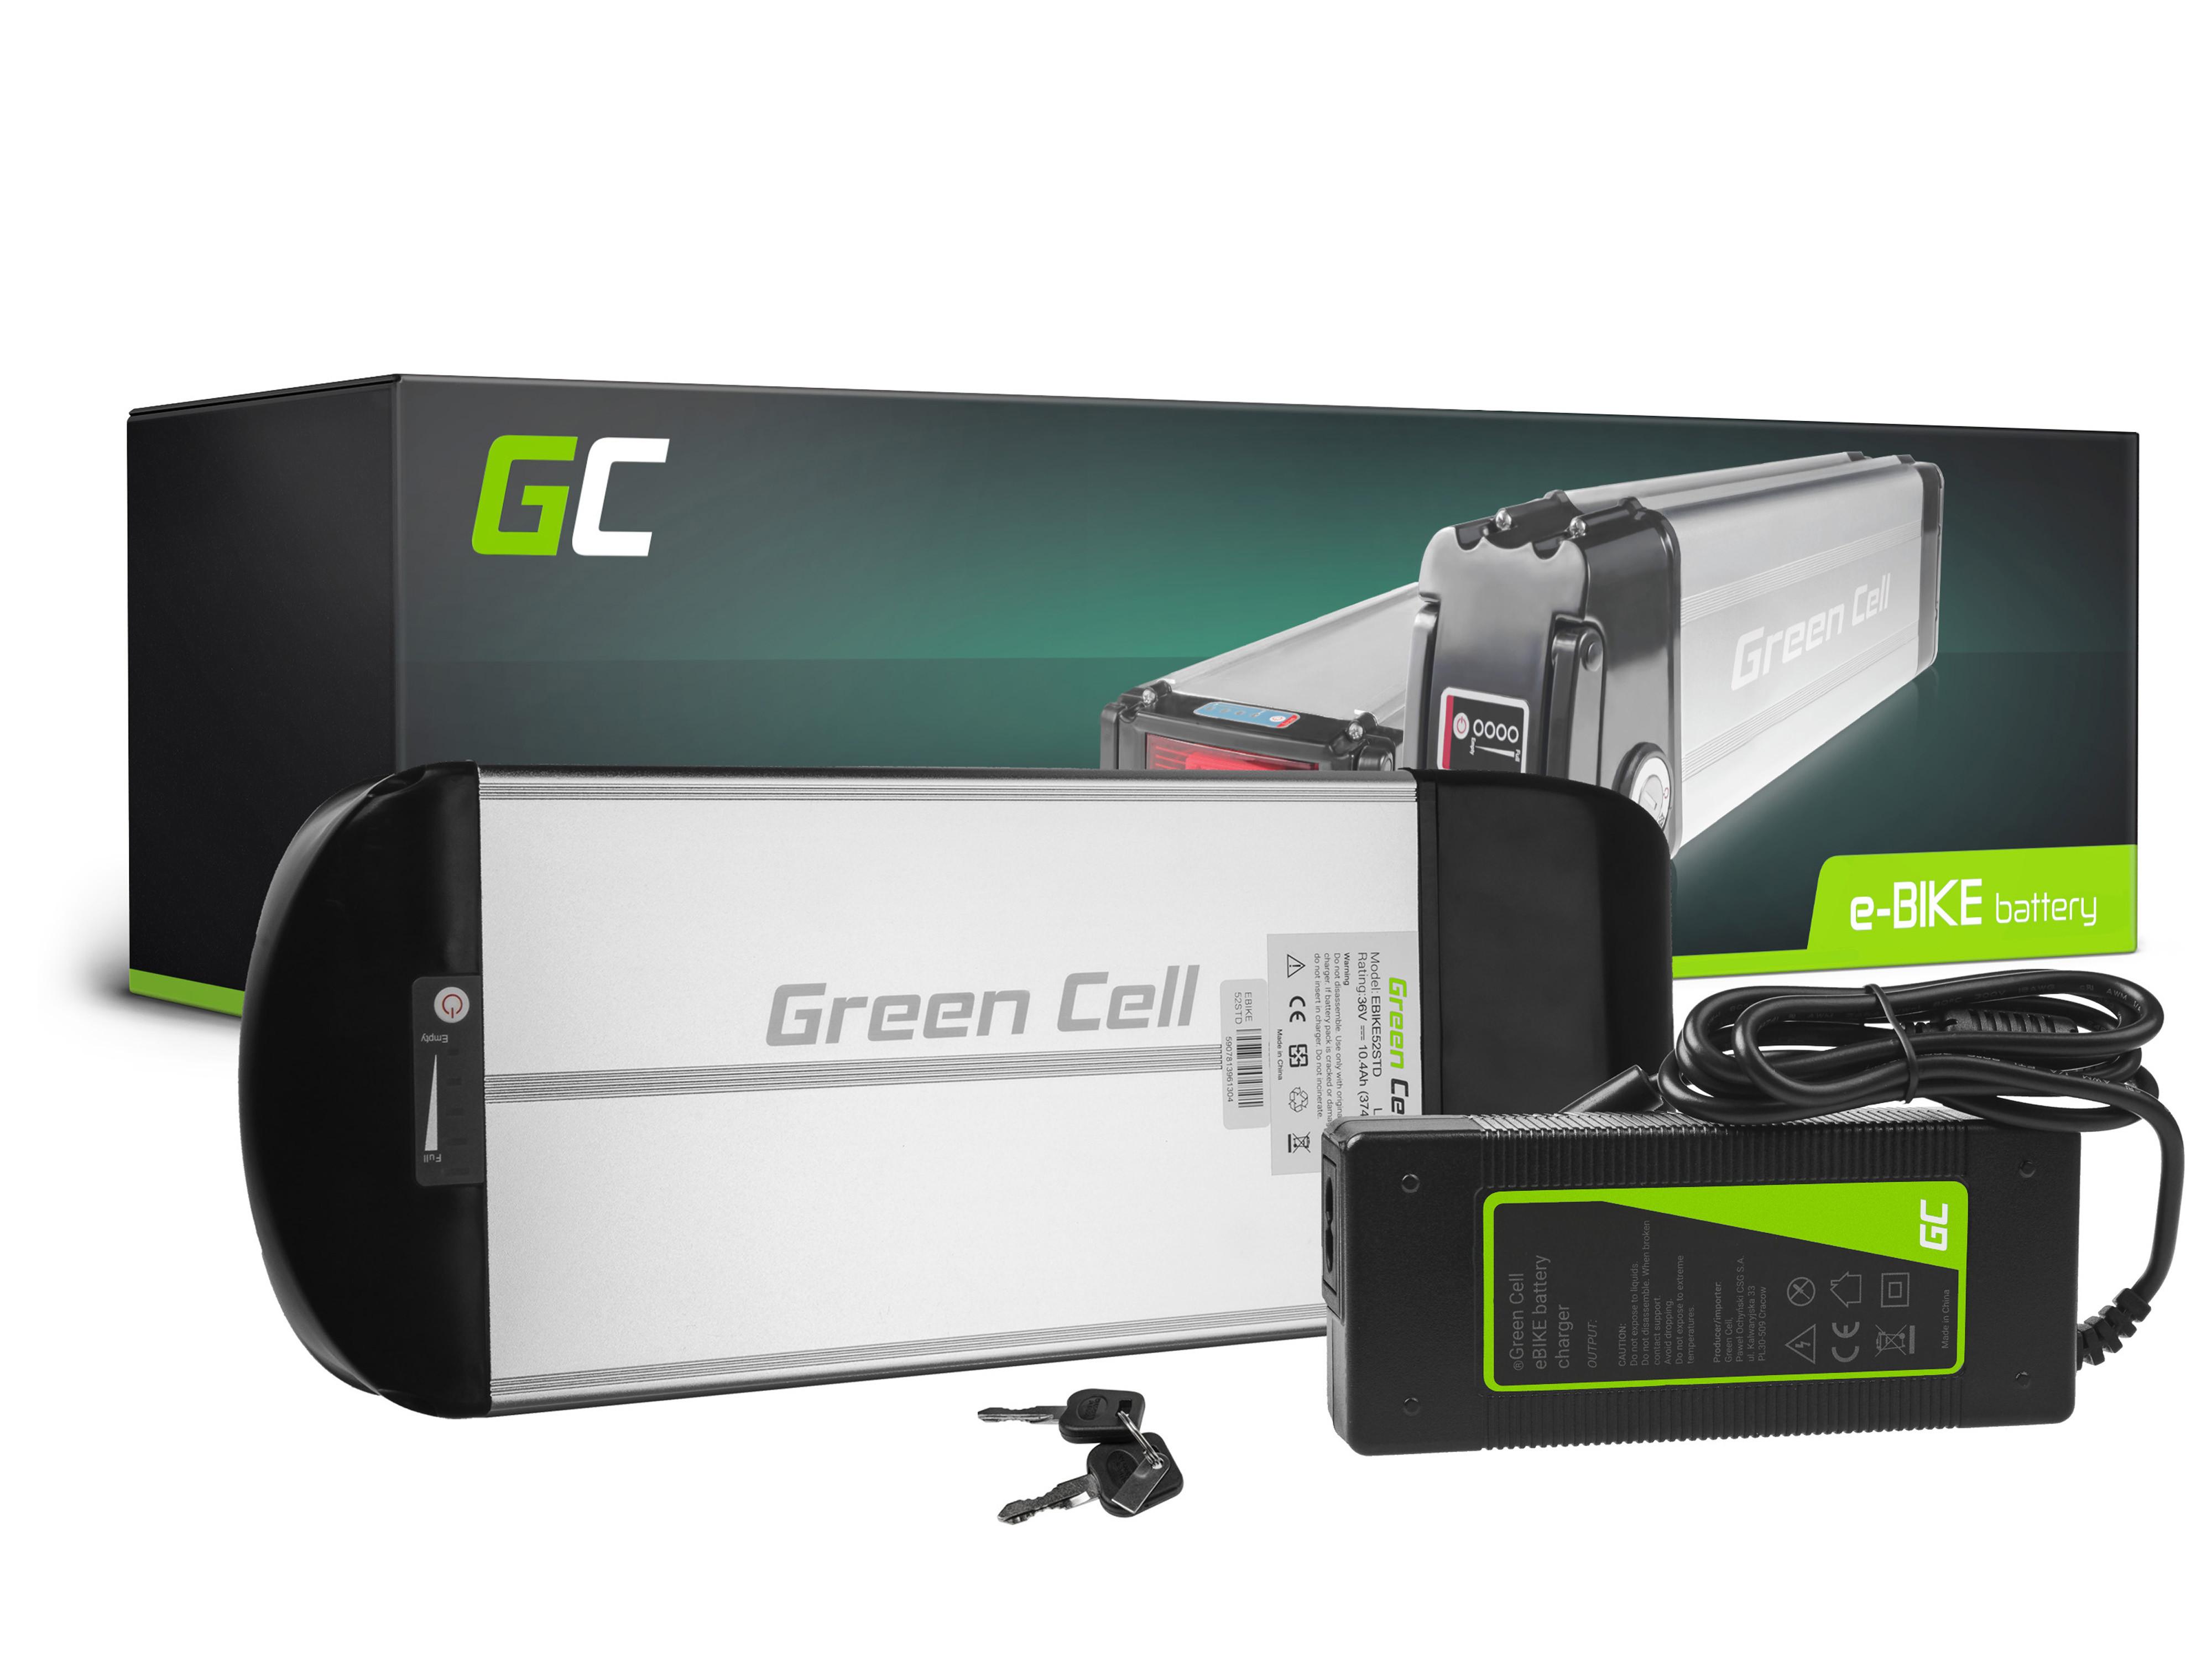 Green Cell® Battery for E-bike 36V 10Ah E-Bike Li-Ion Rear Rack with charger